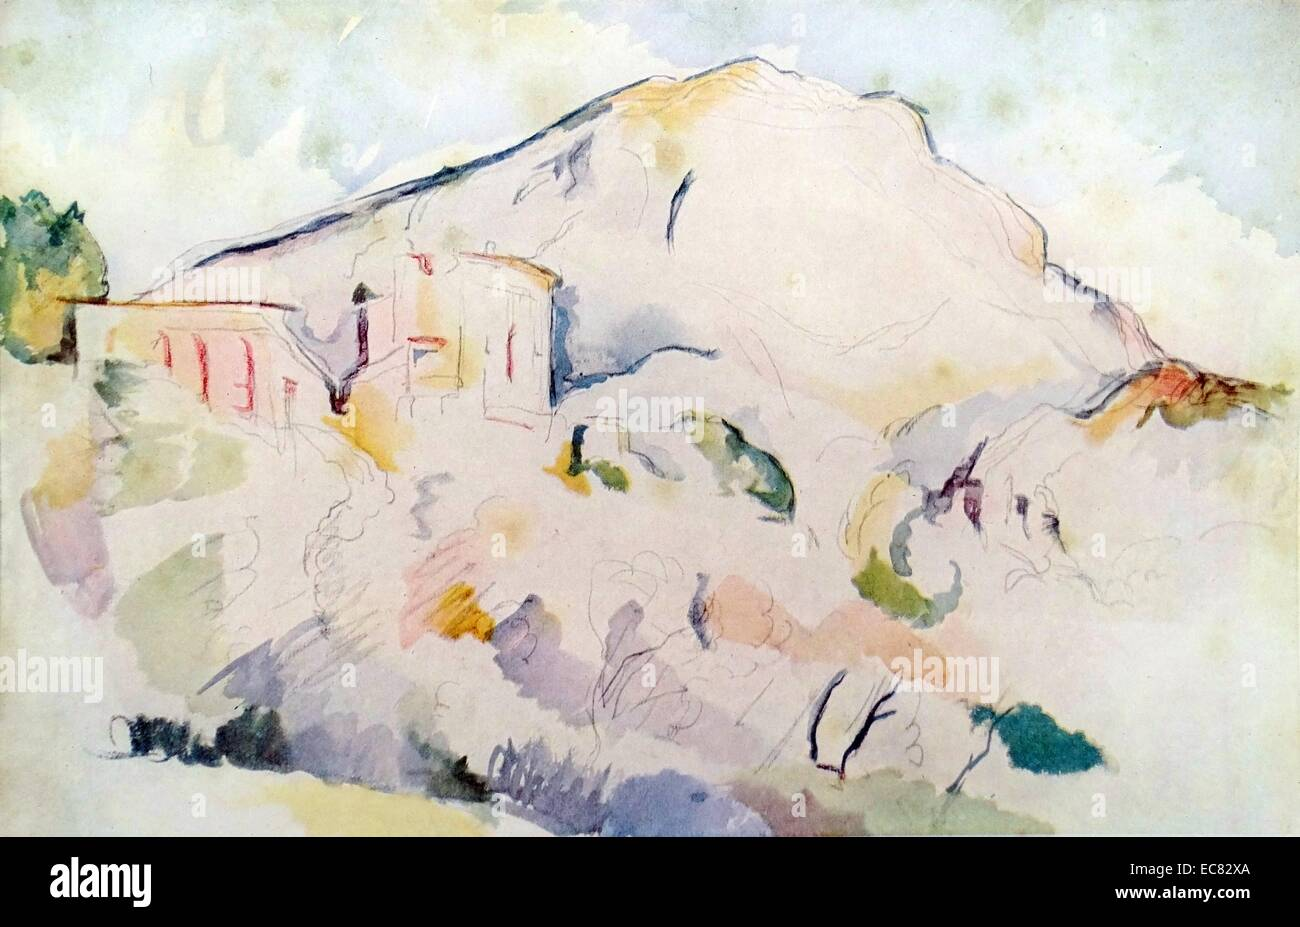 Painting titled 'Mont Sainte-Victoire and Château Noir' - Stock Image